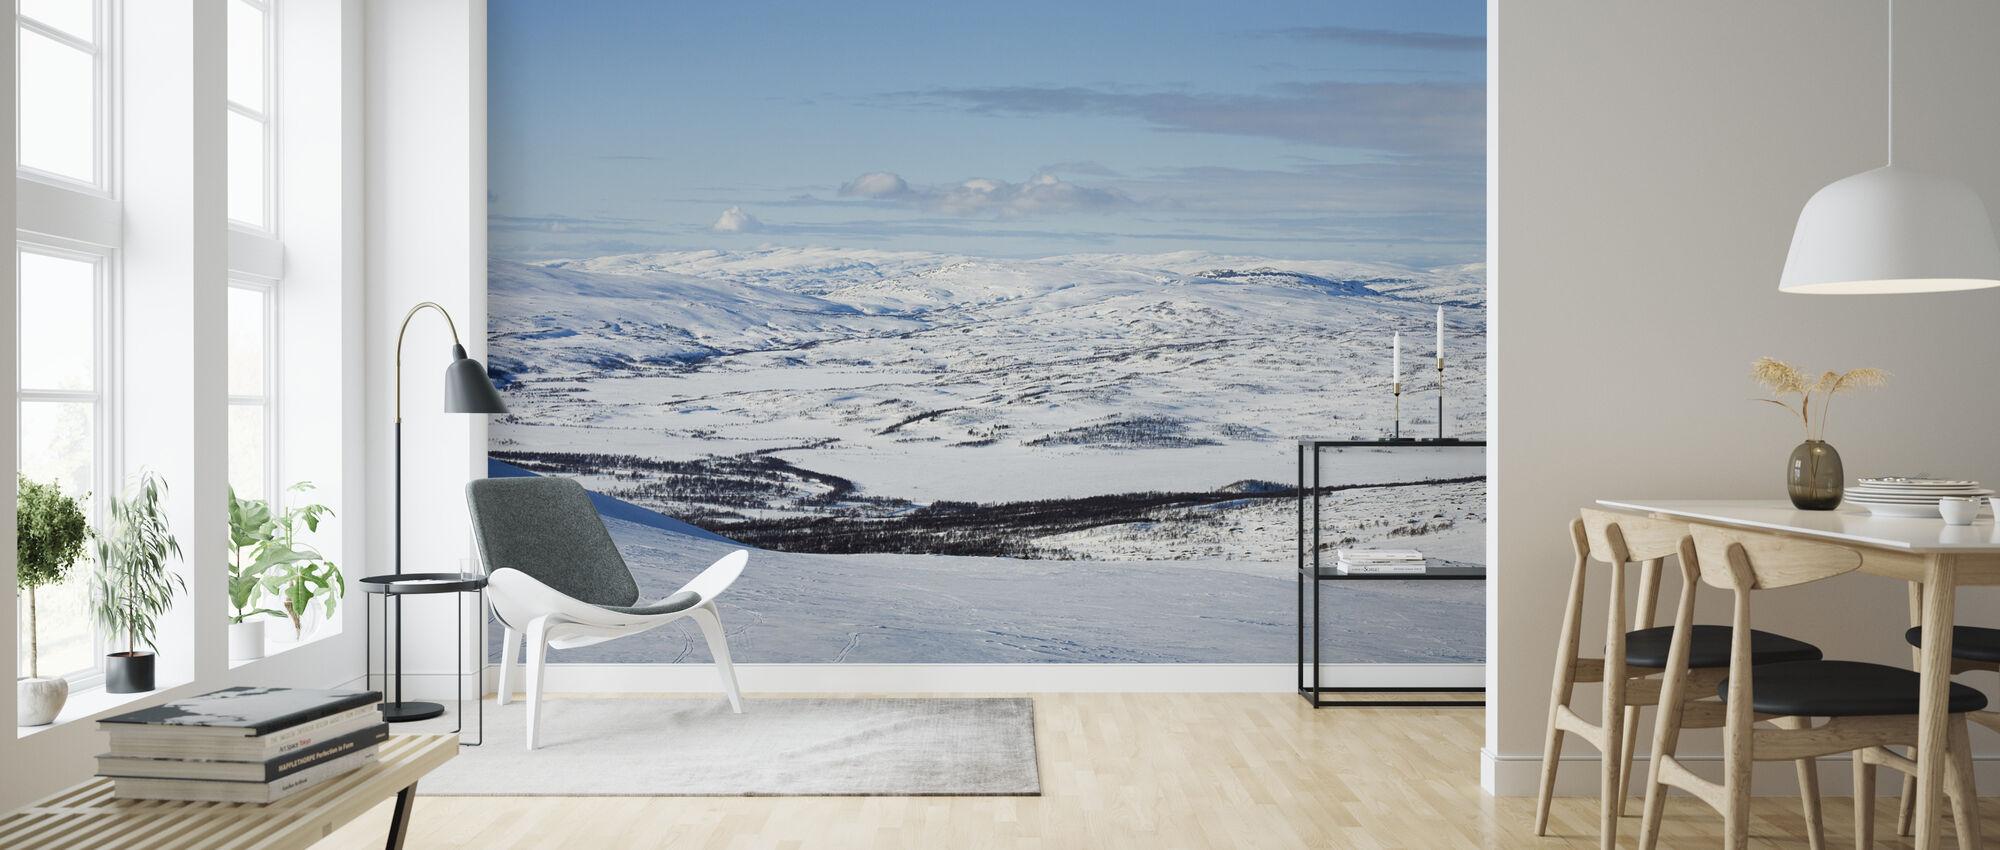 Snowy Landscape of Jämtland, Sweden - Wallpaper - Living Room